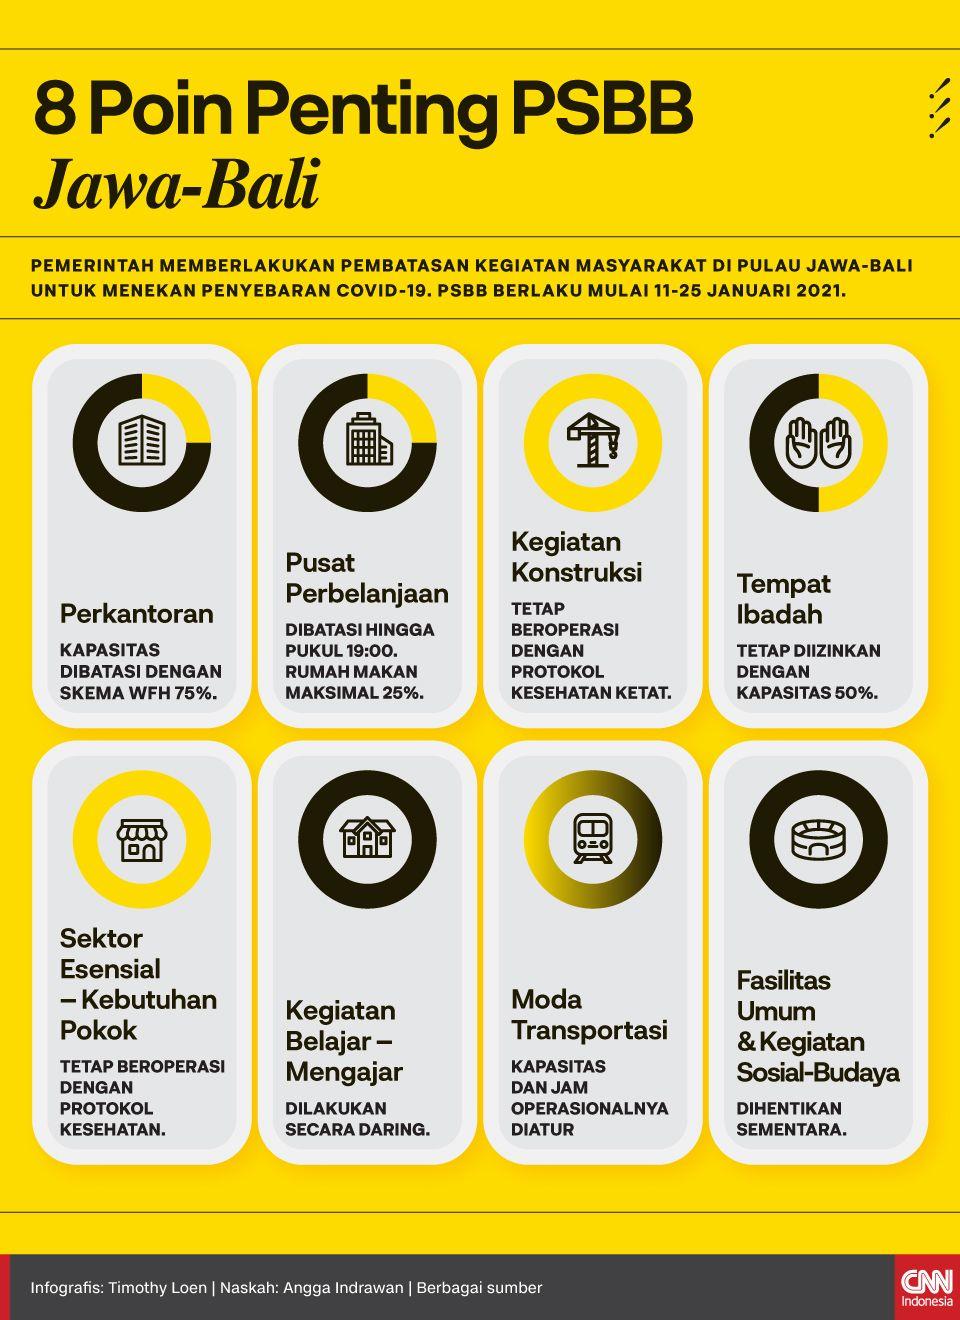 Pemerintah memberlakukan pembatasan kegiatan masyarakat di Pulau Jawa-Bali untuk menekan penyebaran Covid-19. PSBB berlaku mulai 11-25 Januari 2021.